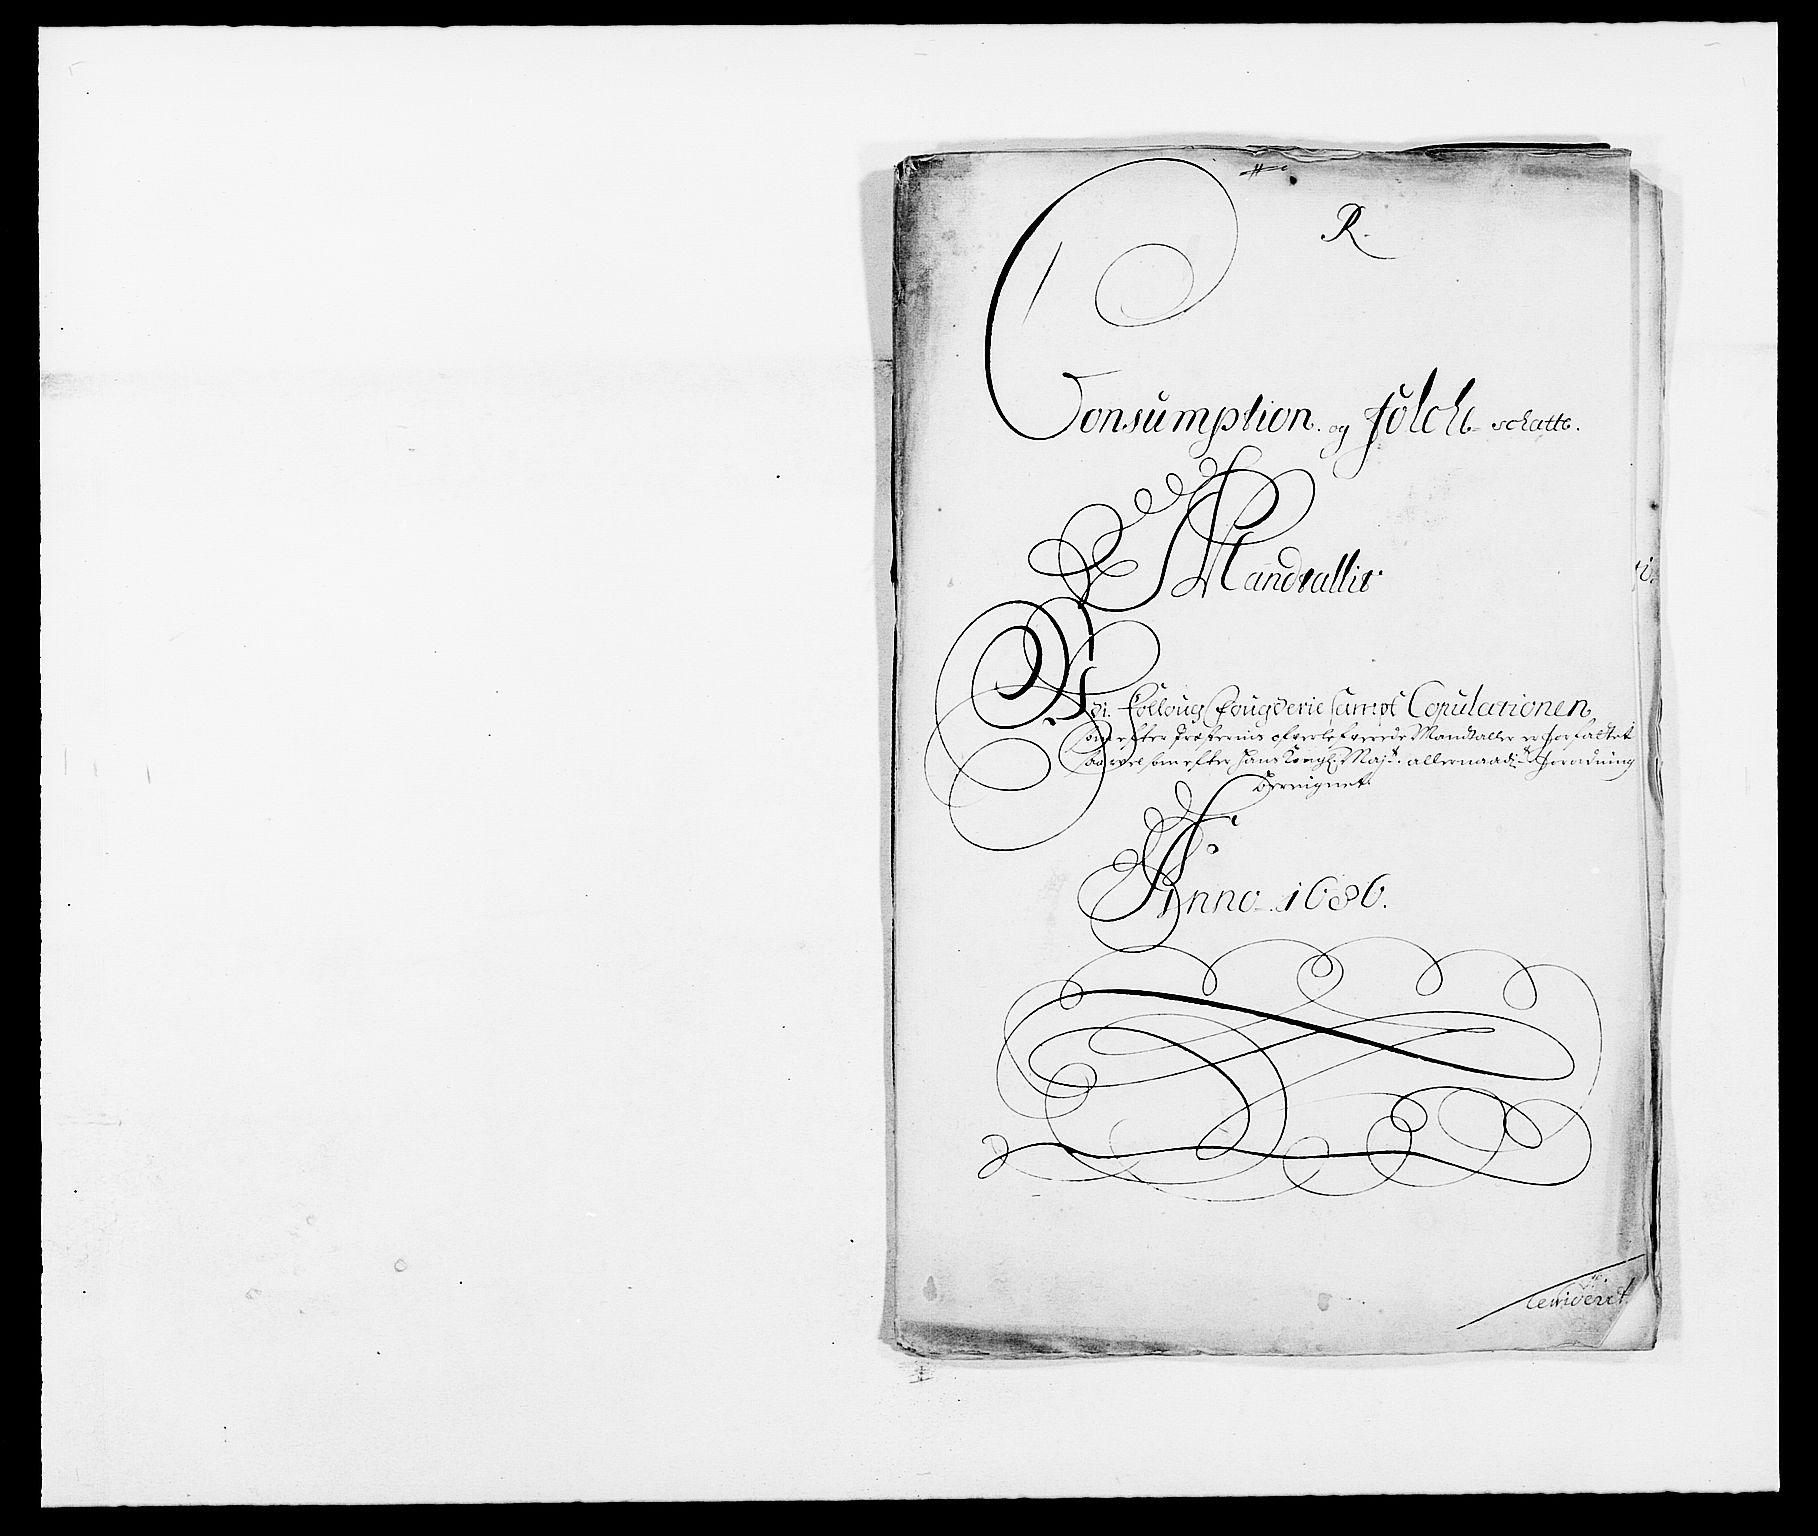 RA, Rentekammeret inntil 1814, Reviderte regnskaper, Fogderegnskap, R09/L0433: Fogderegnskap Follo, 1685-1686, s. 427